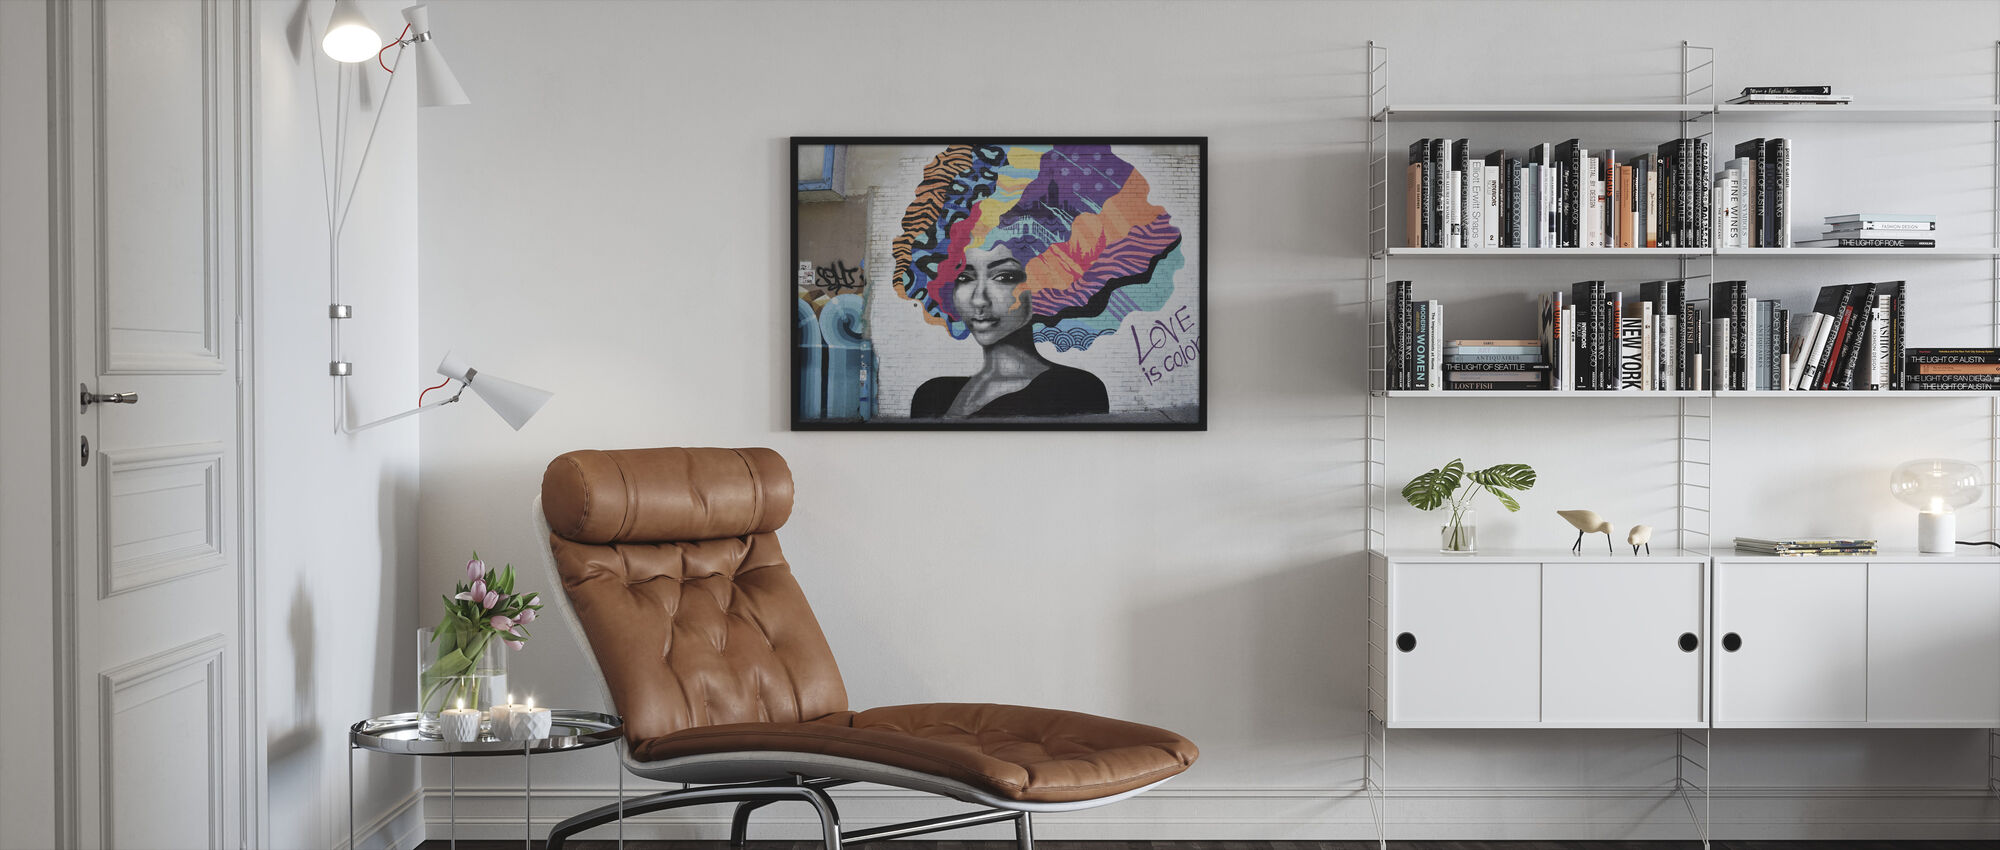 Woman Graffiti - Framed print - Living Room